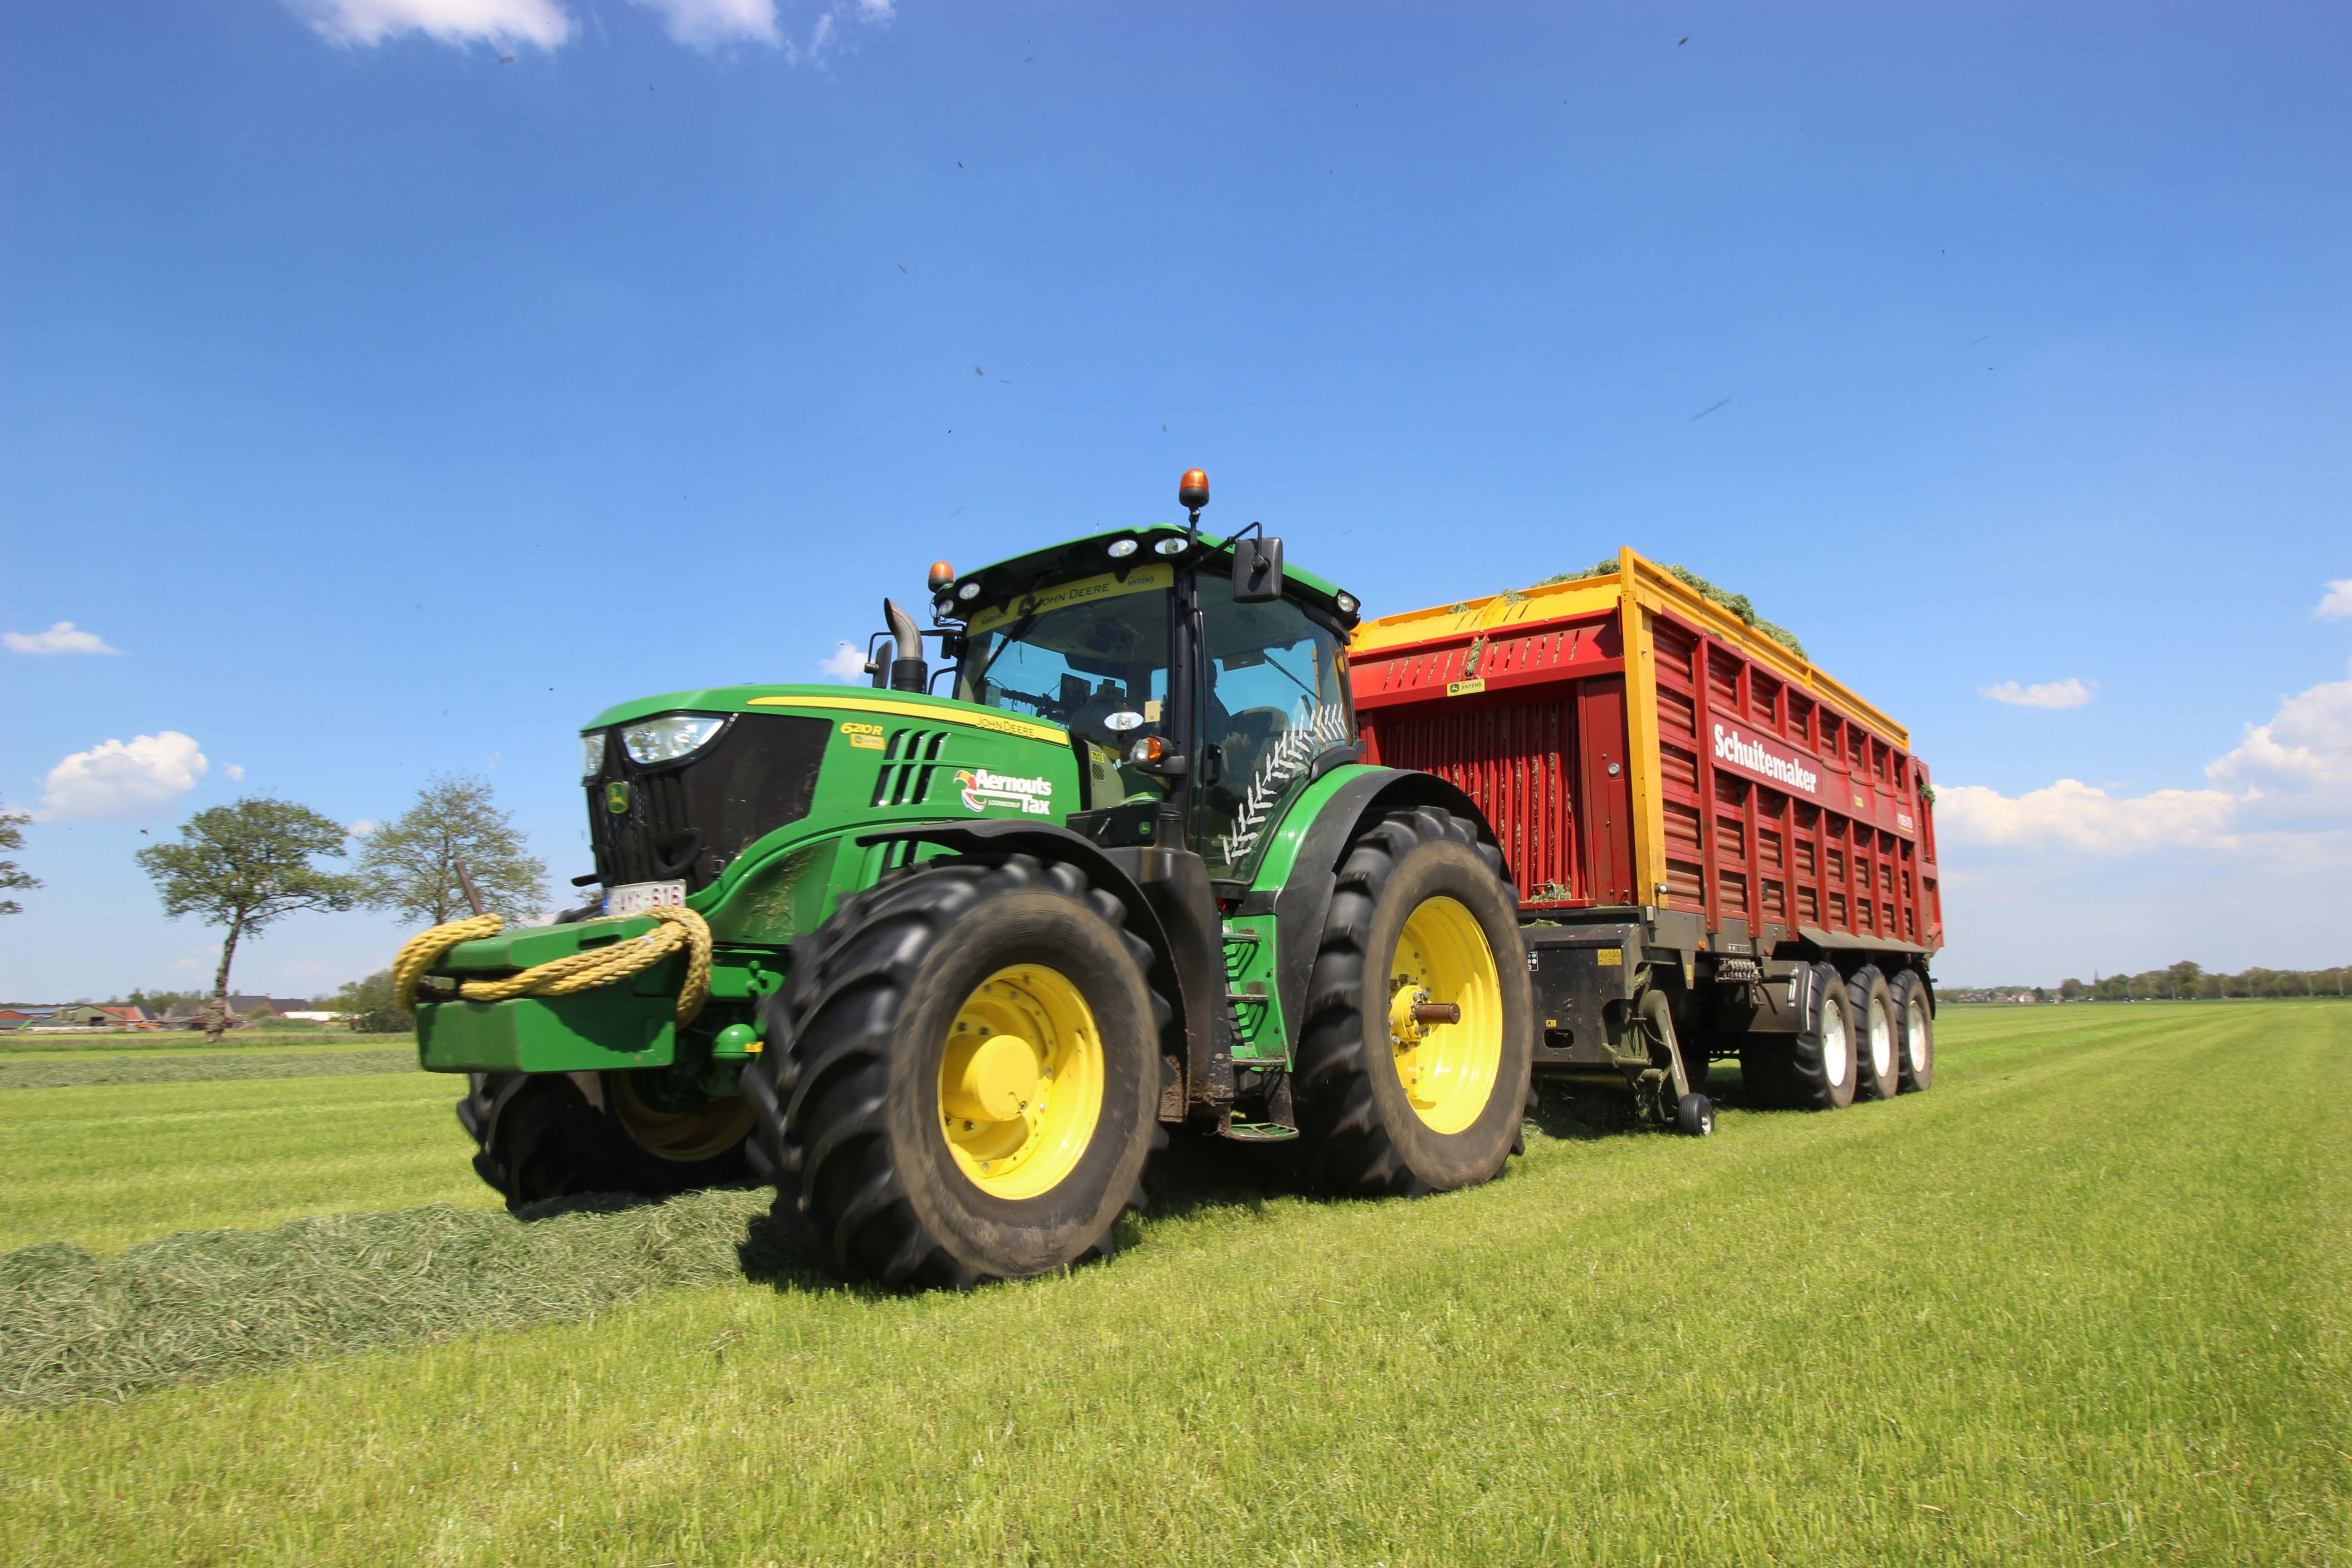 gras oprapen snijwagen belgie aernoutstax